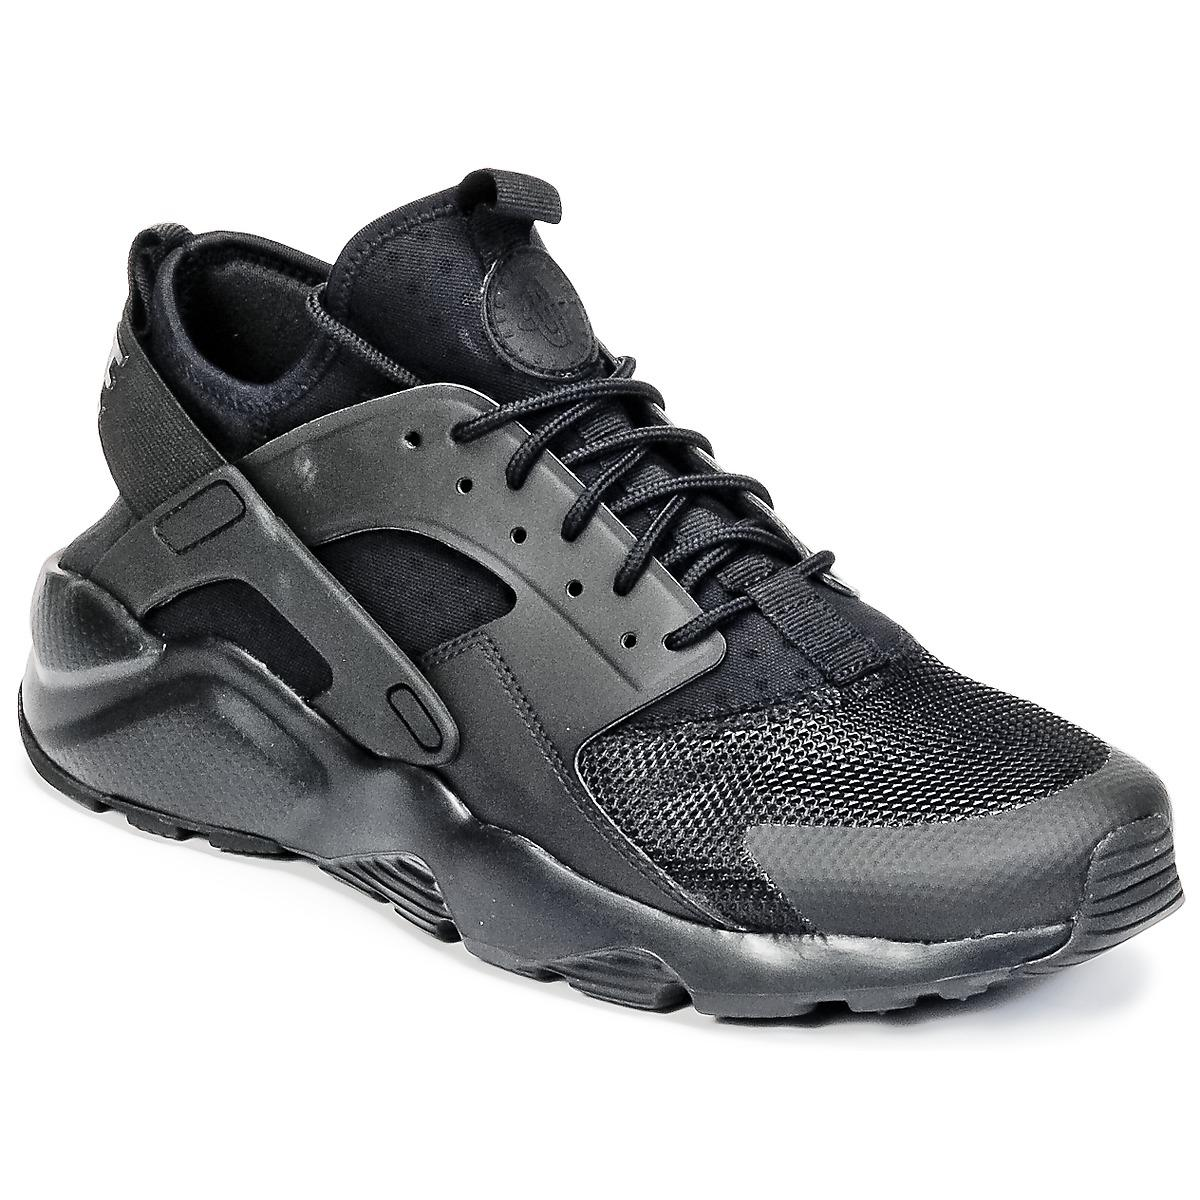 lowest price 80893 d8726 Nike - Air Huarache Run Ultra Men s Shoes (trainers) In Black for Men -. View  fullscreen